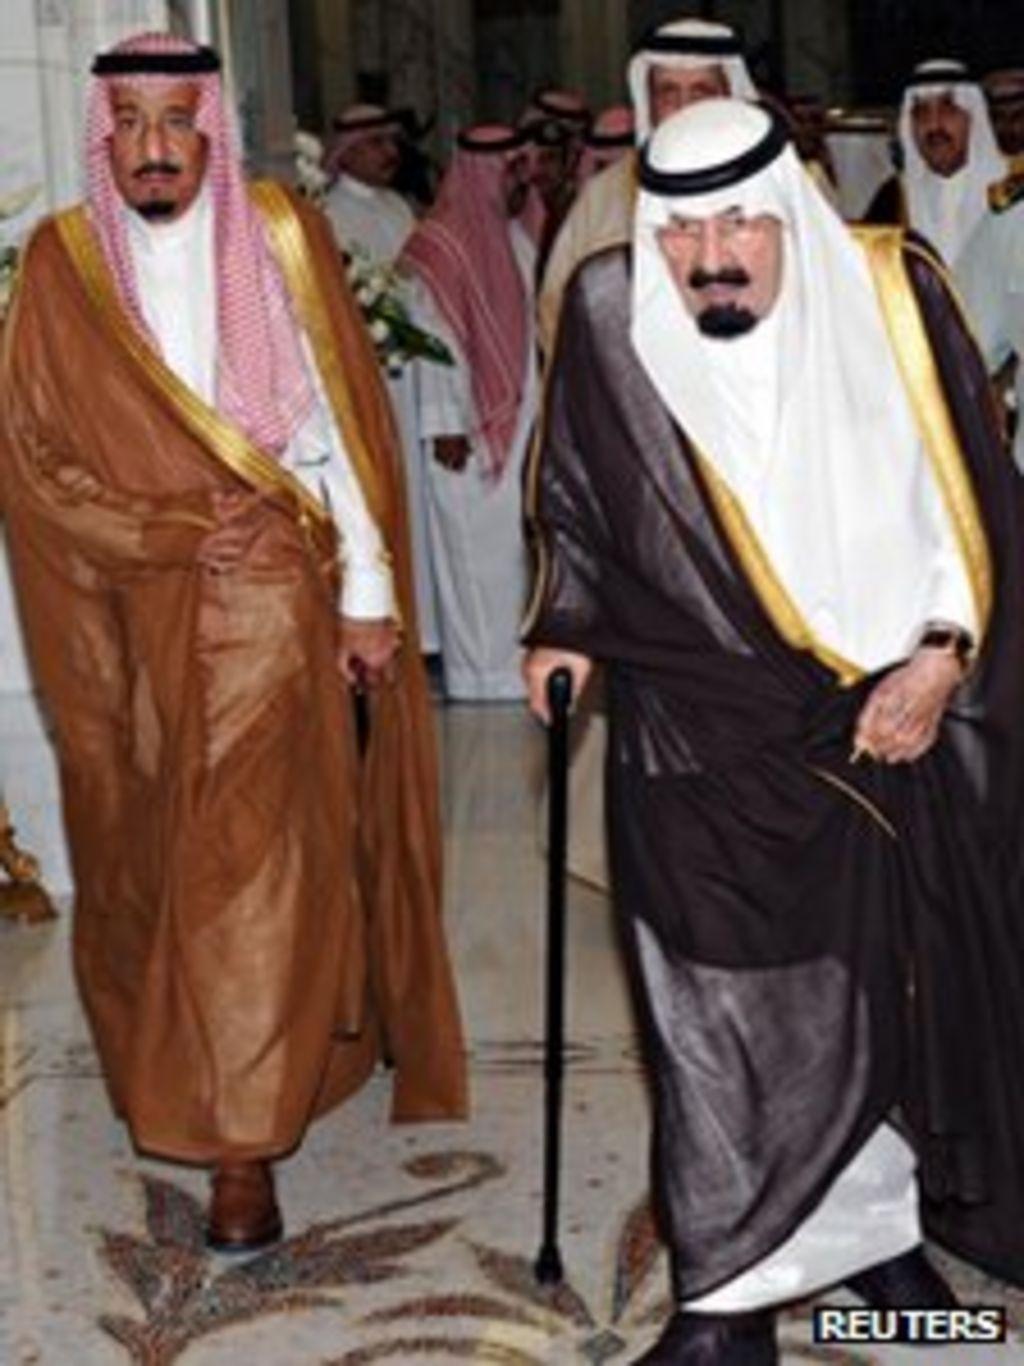 Saudi Arabia buries Crown Prince Nayef - BBC News